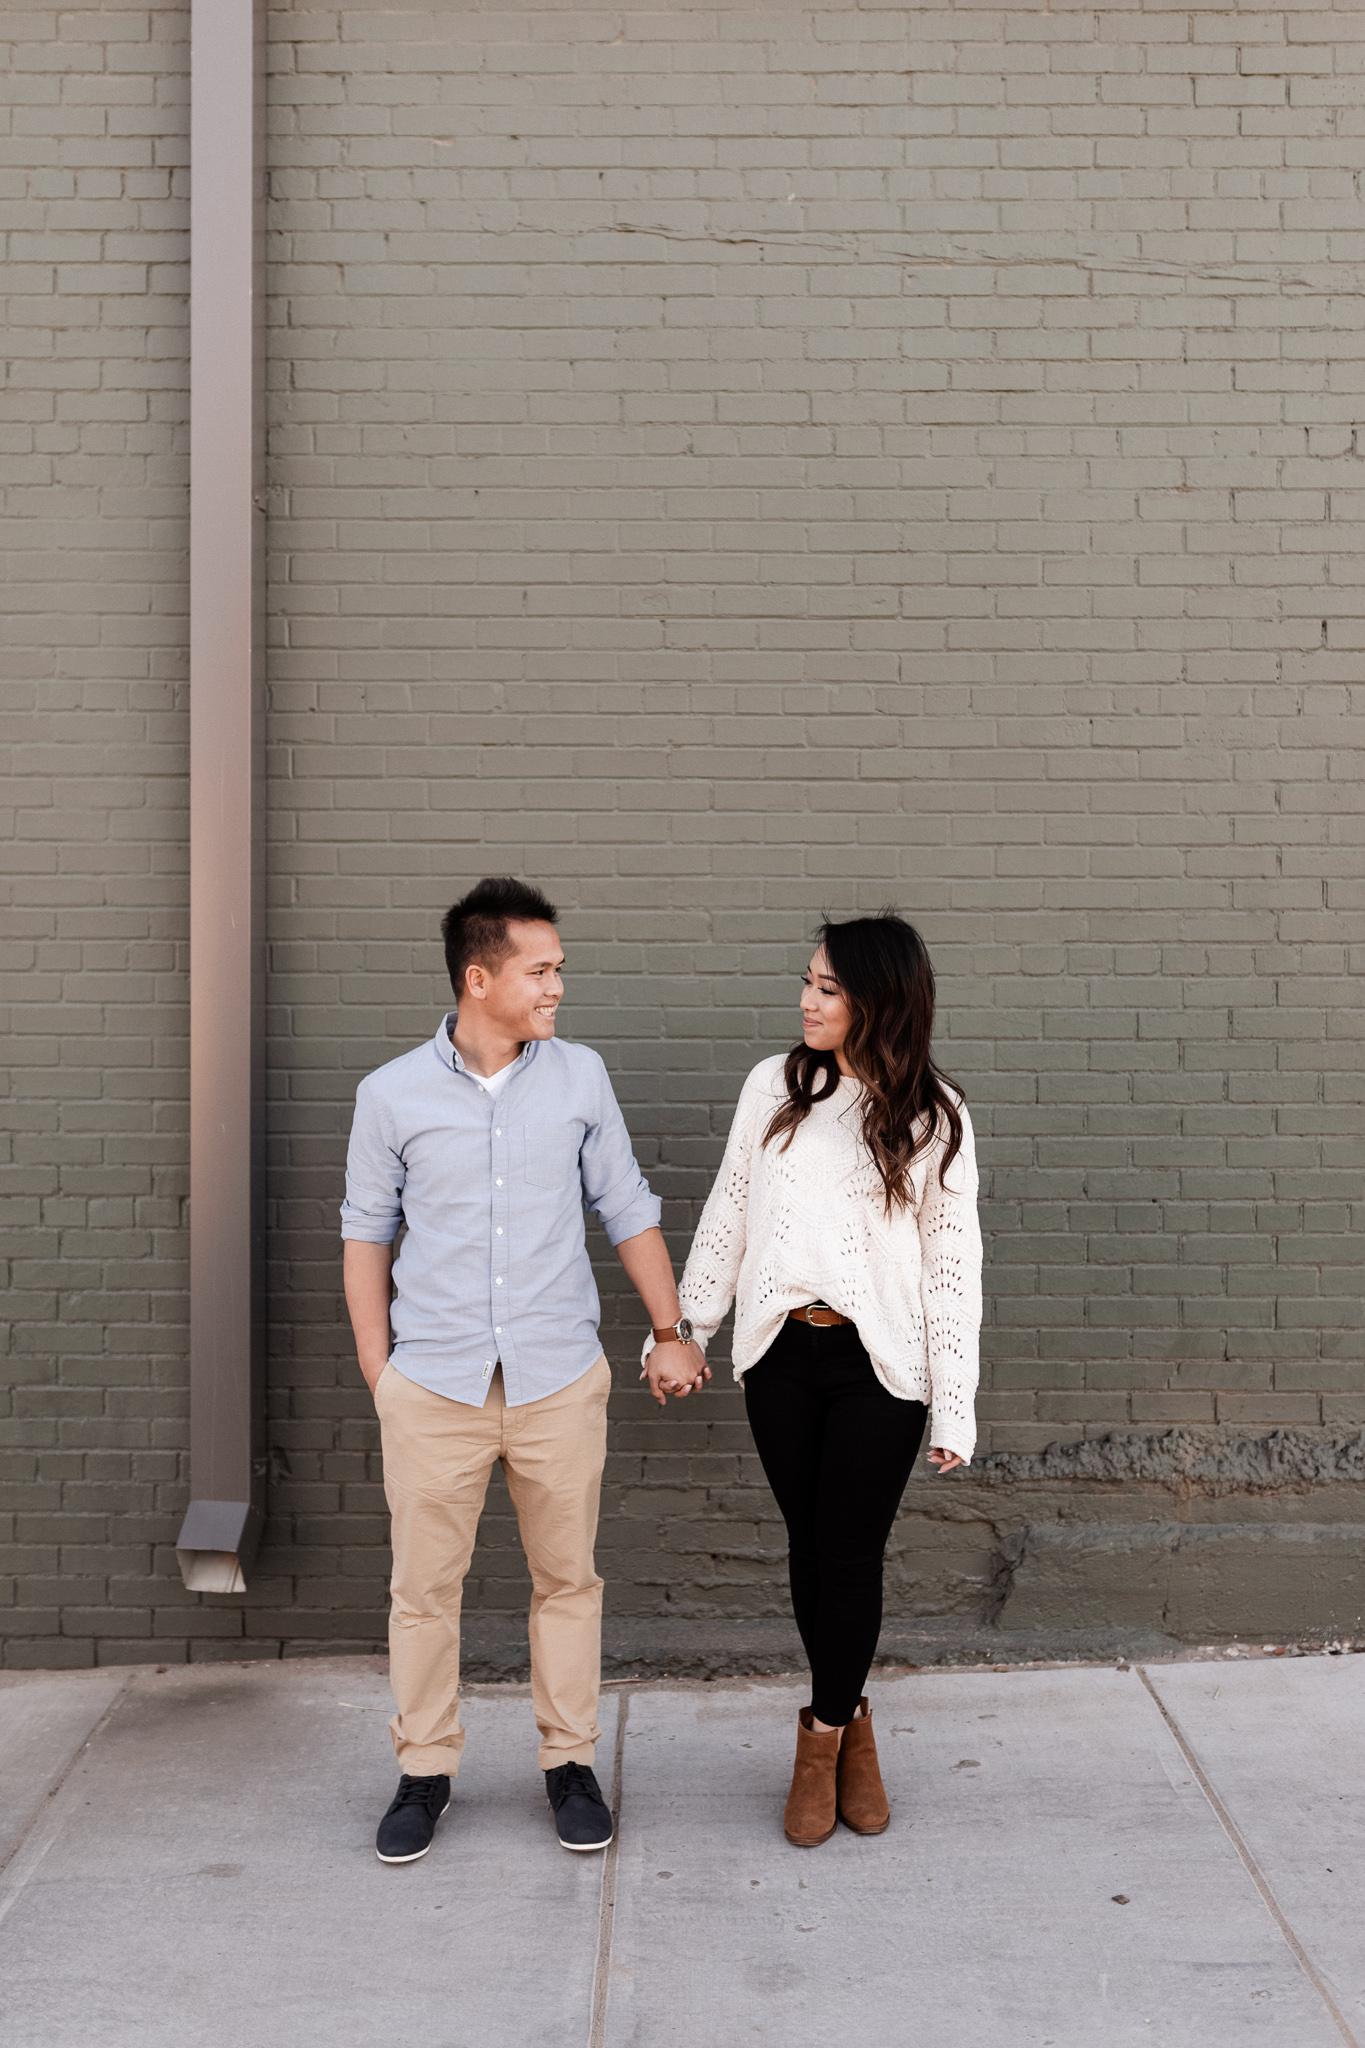 Hieu + Teresa | Colorful Romantic Downtown Engagements | Oklahoma Wedding Photographer-44.jpg